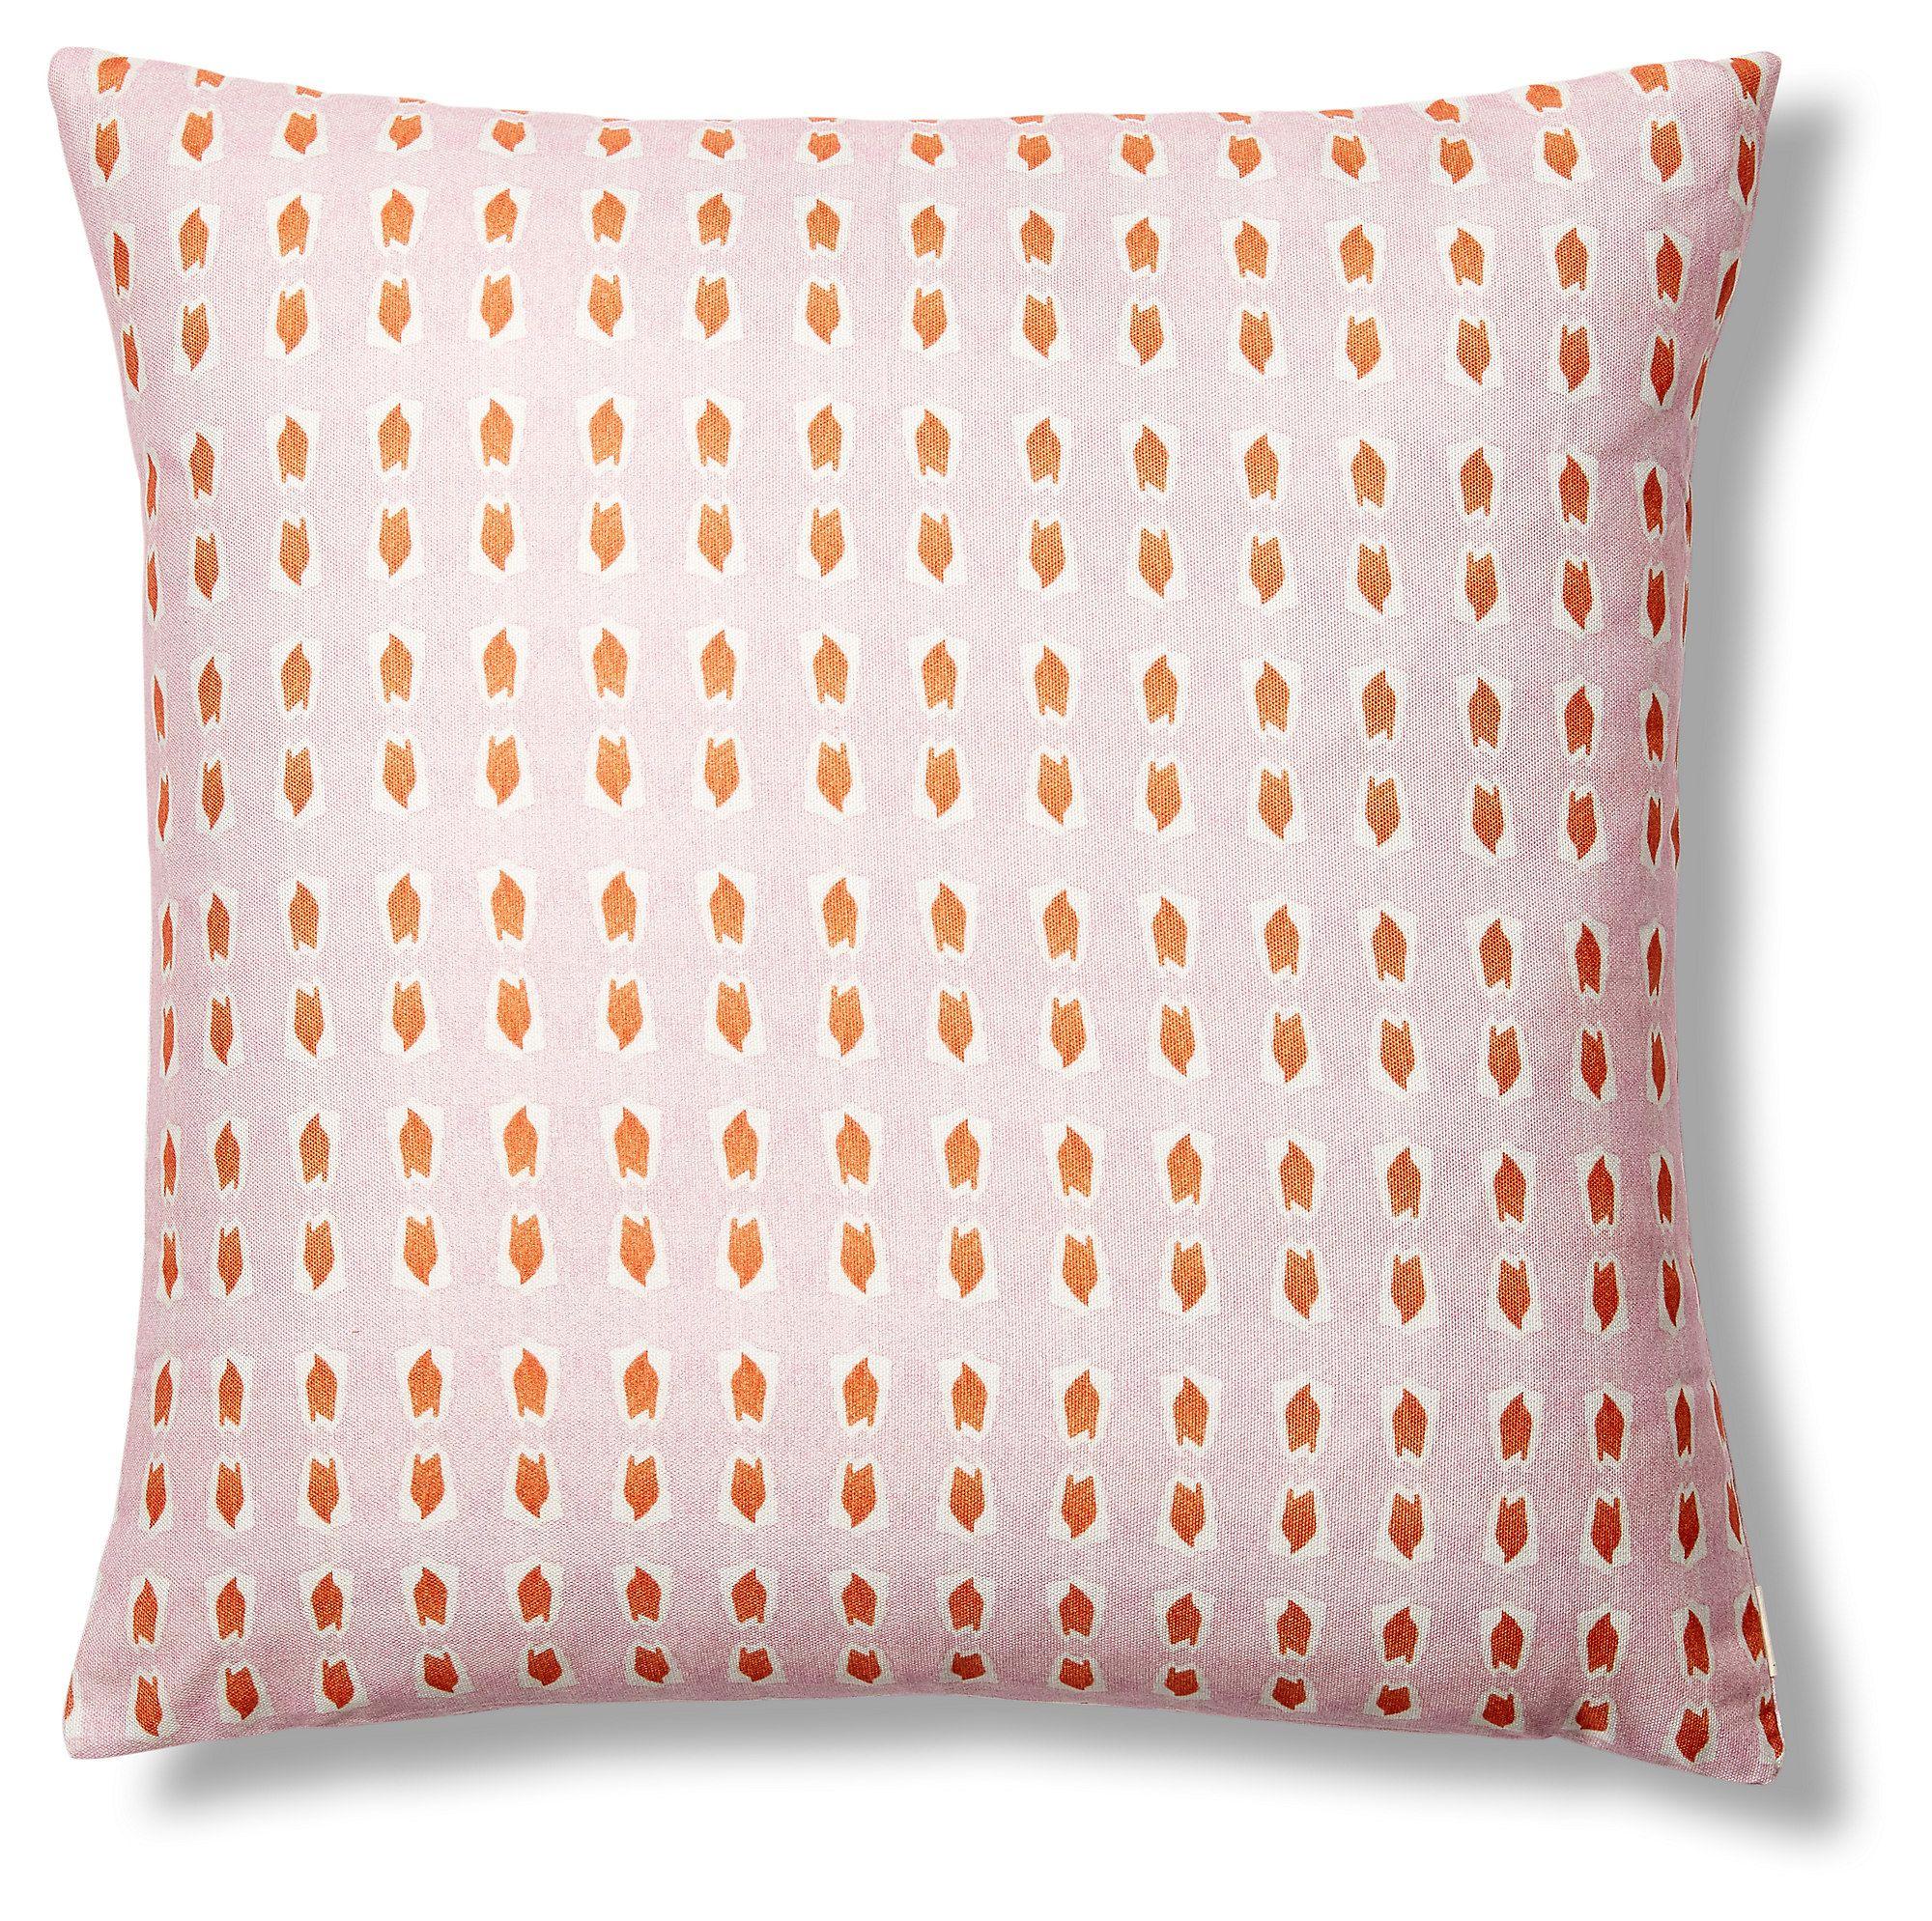 Picos 20x20 Pillow Pink Orange Pillows Decorative